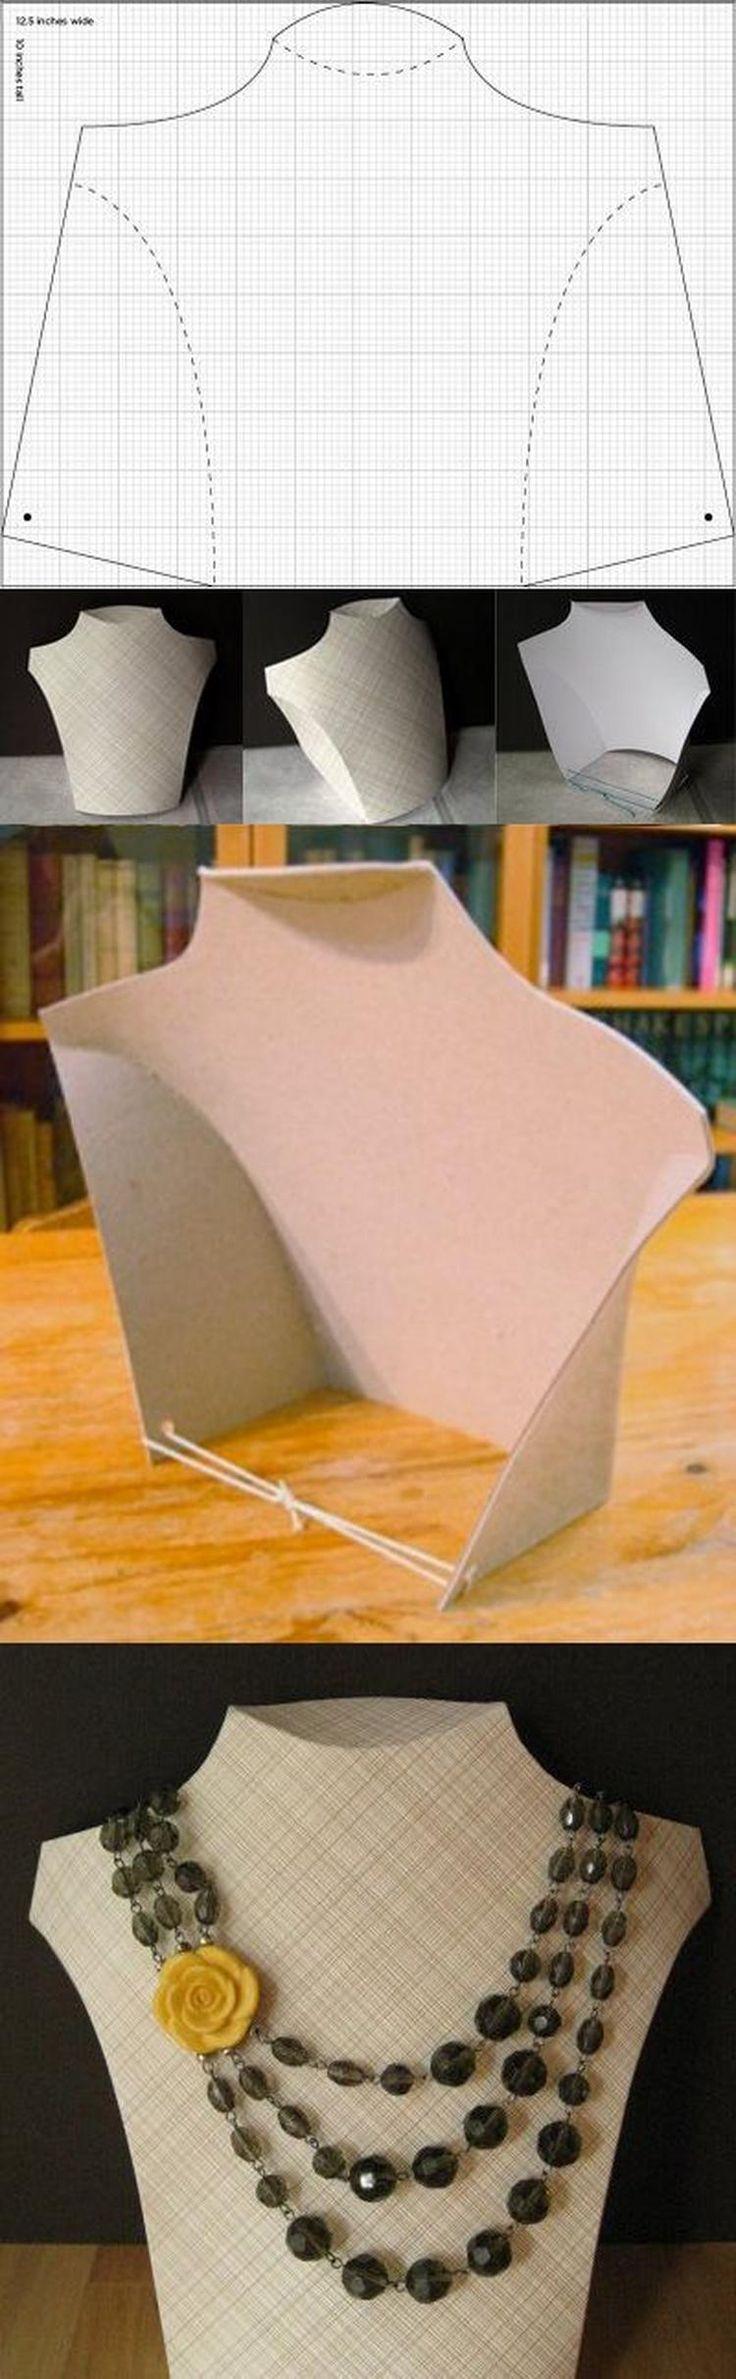 DIY Cardboard Necklace Display Tutorial and Pattern